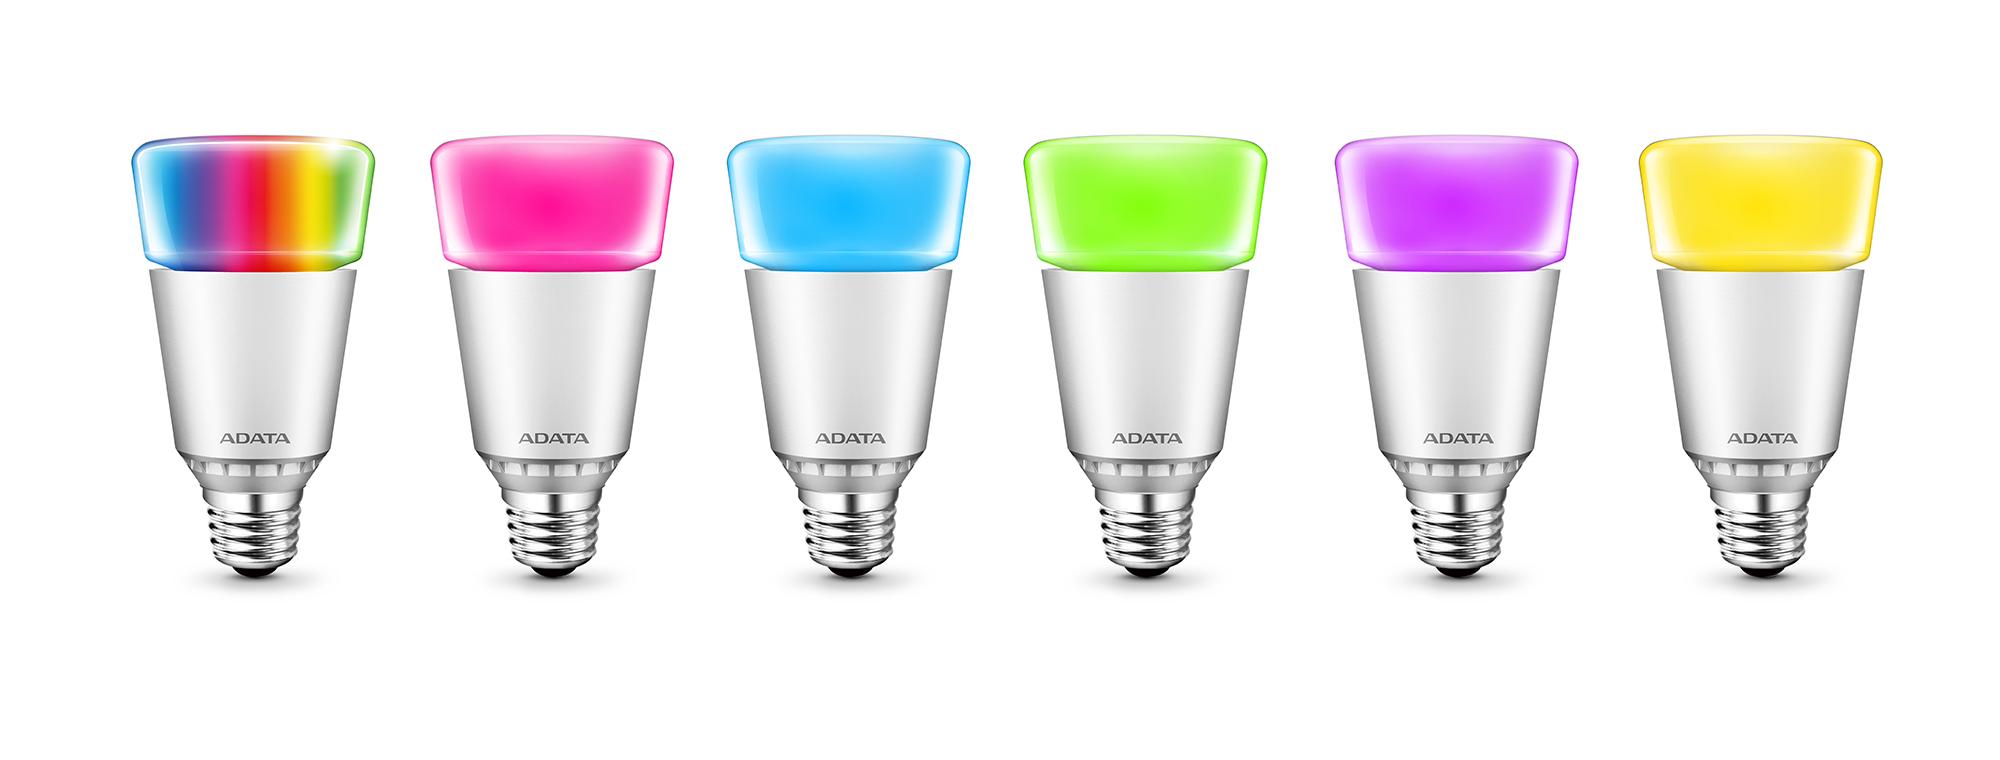 ADATA's AURA RGB bulb